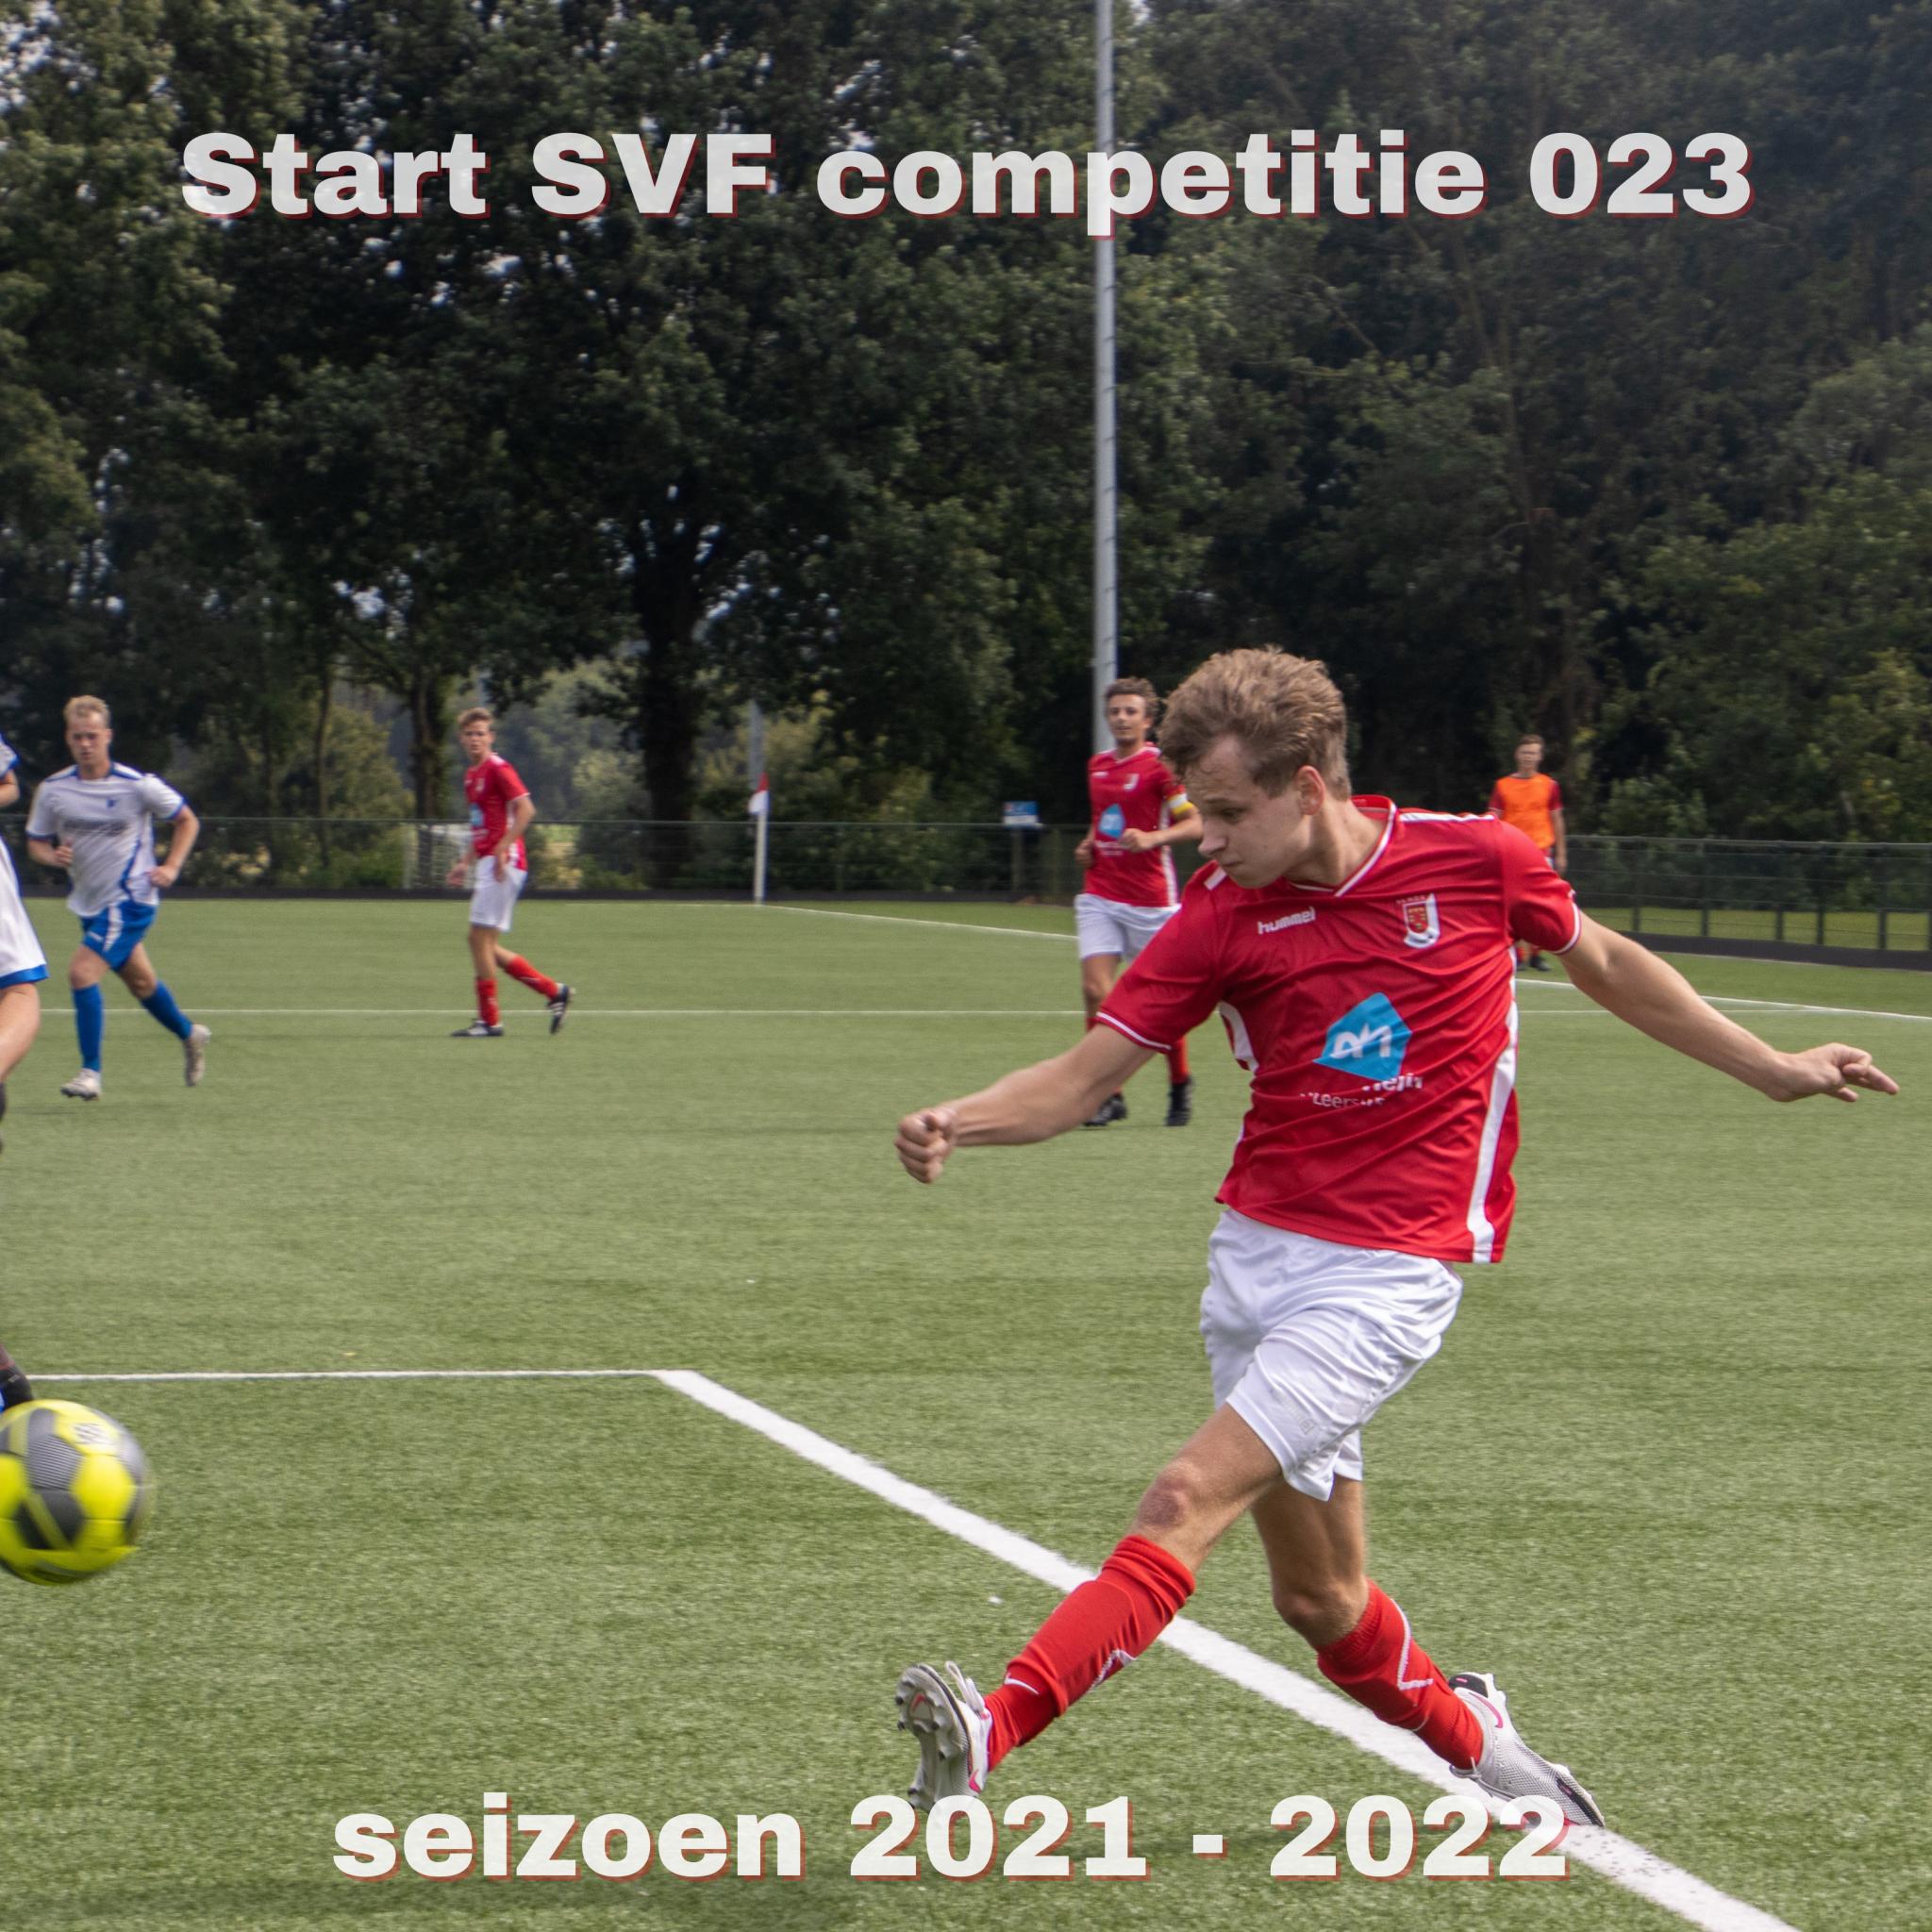 Start SVF competitie O23 seizoen 2021 - 2022